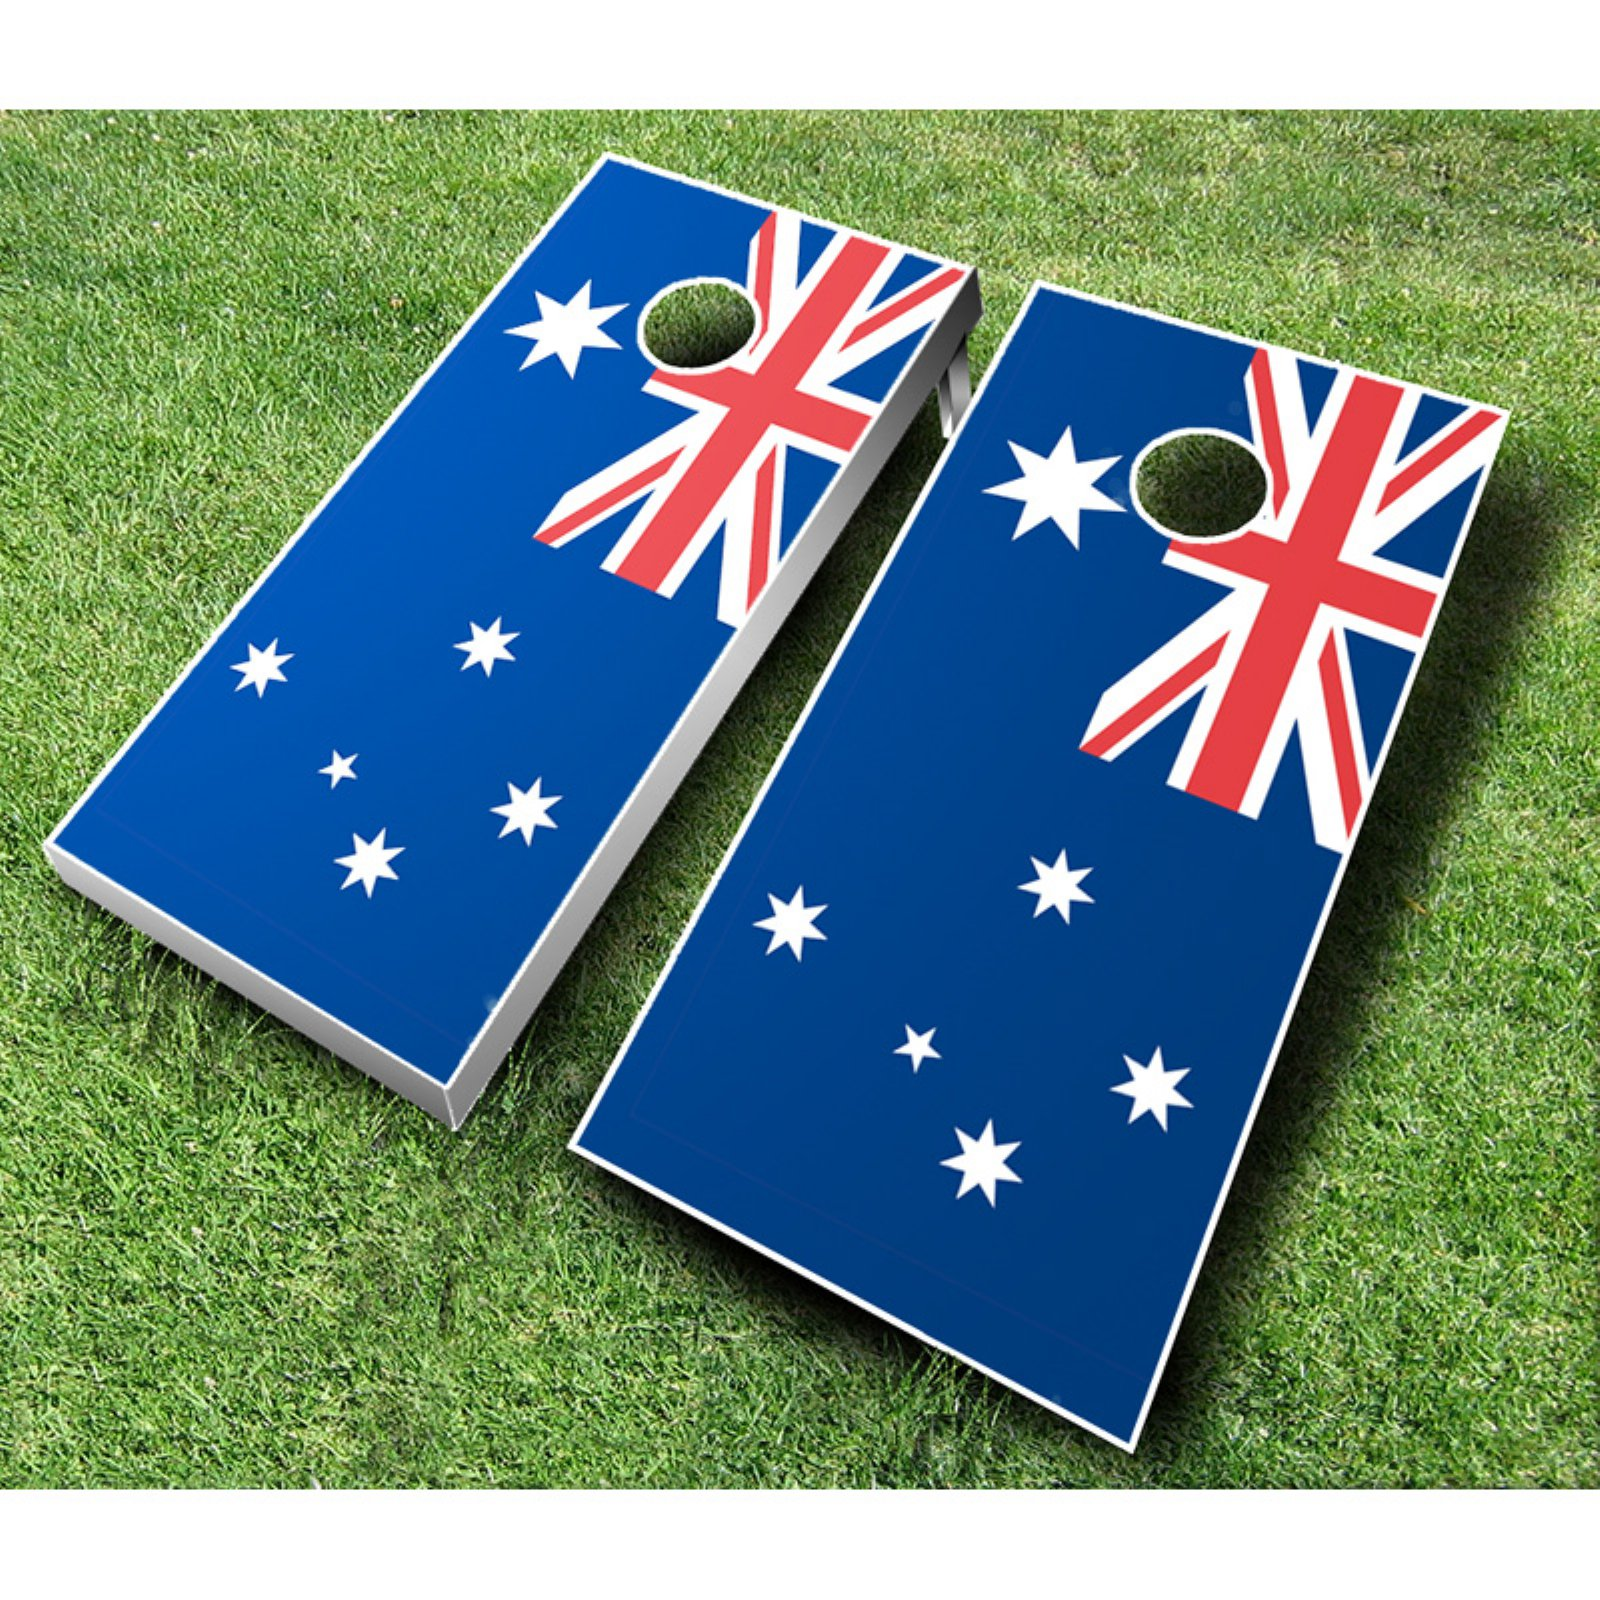 Australian Flag Cornhole Set with Bags by AJJ Cornhole